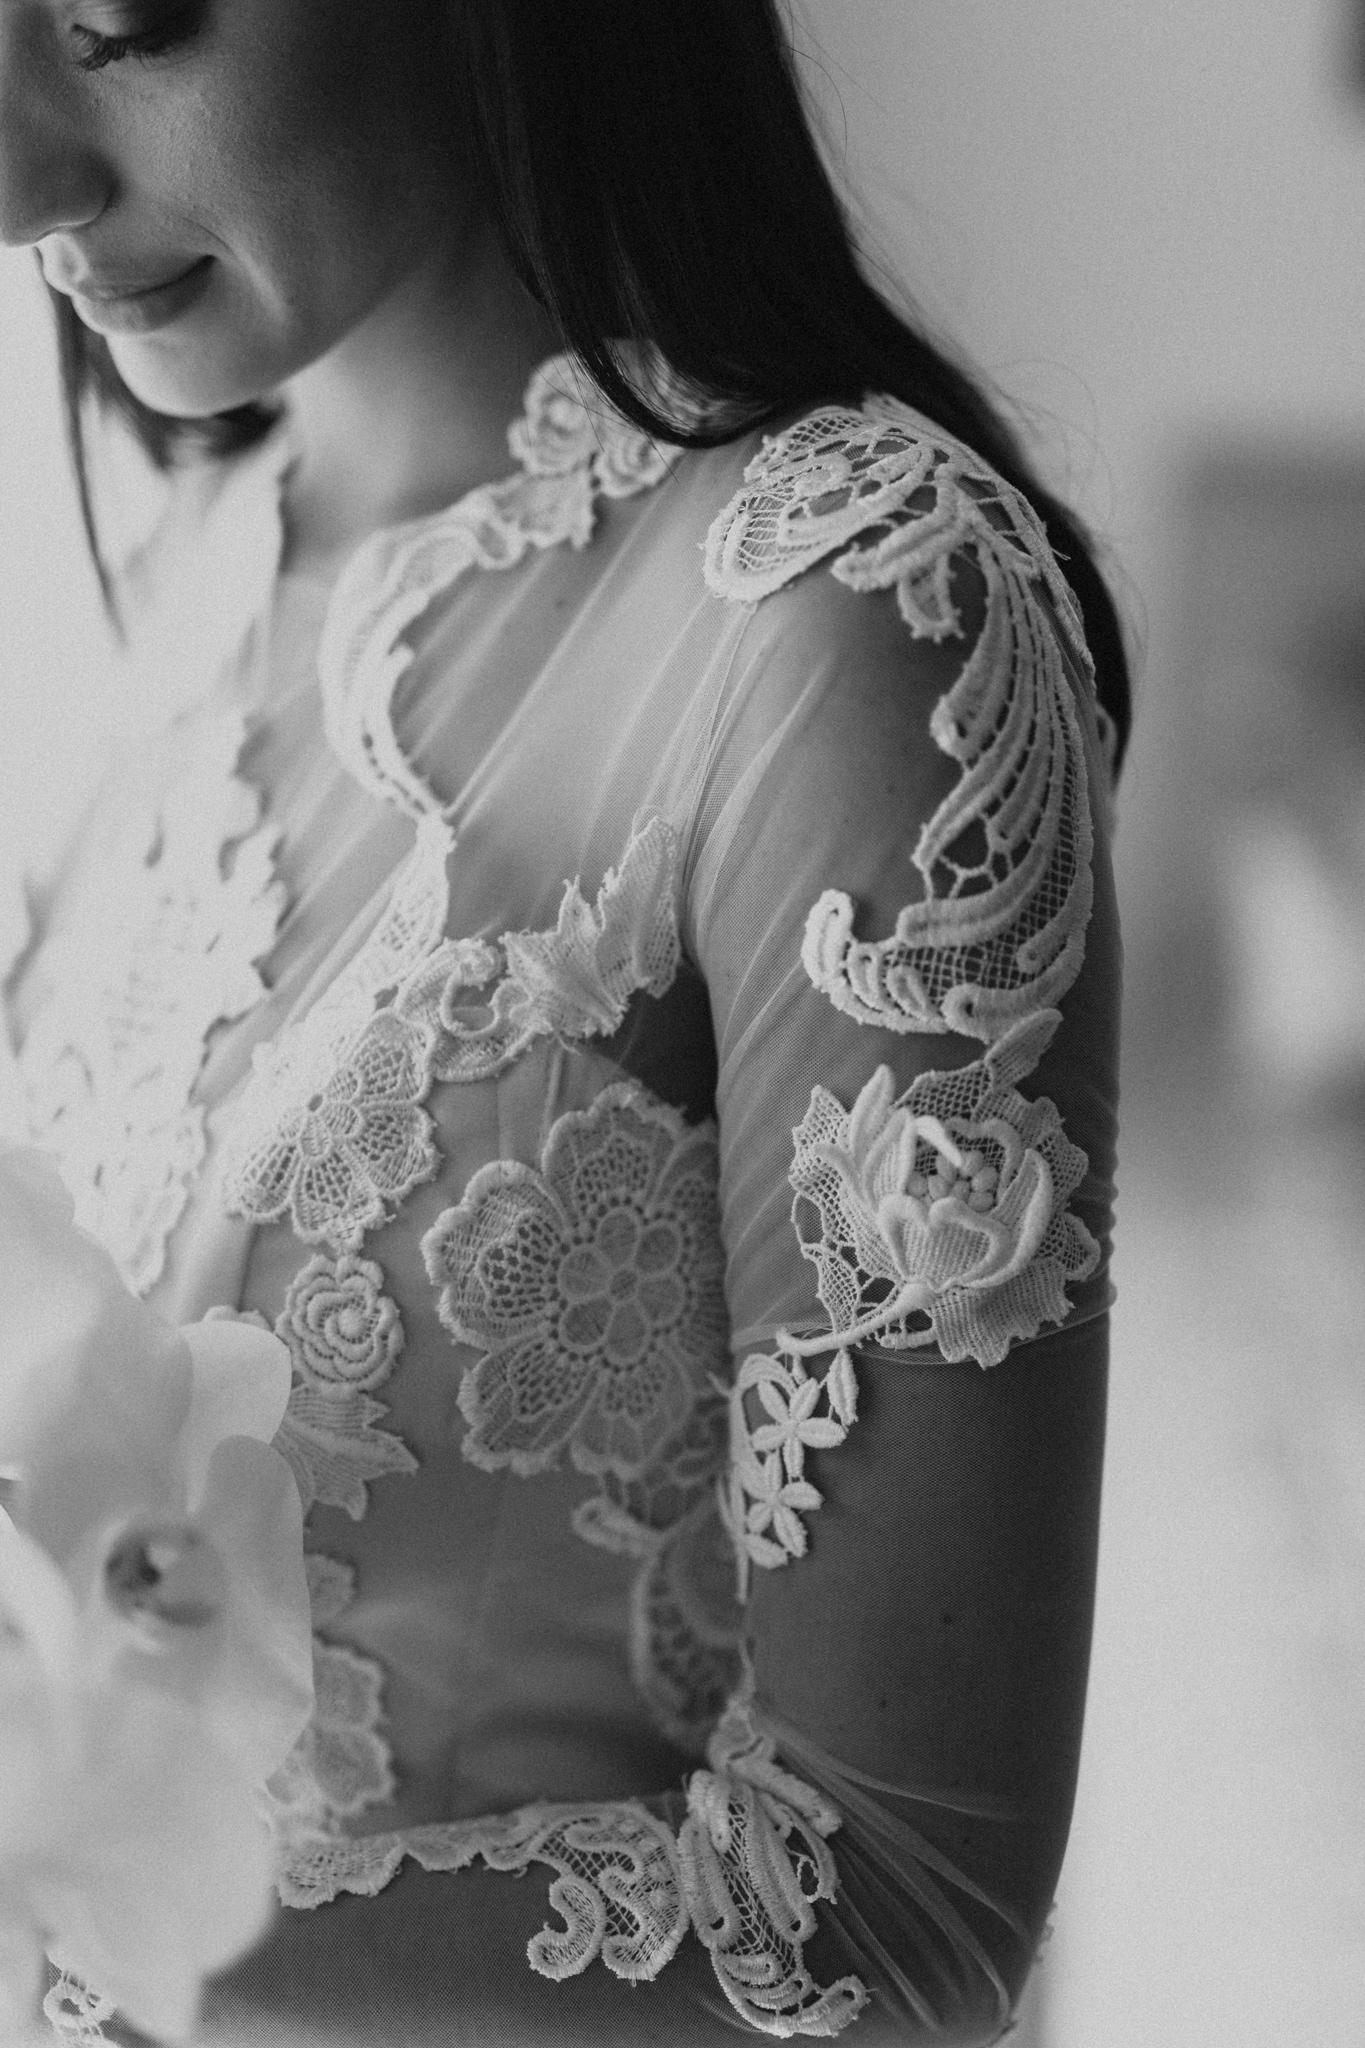 The-Terrace-Royal-Botanic-Gardens-Wedding-Emotions-and-Math-Photography-032.jpg